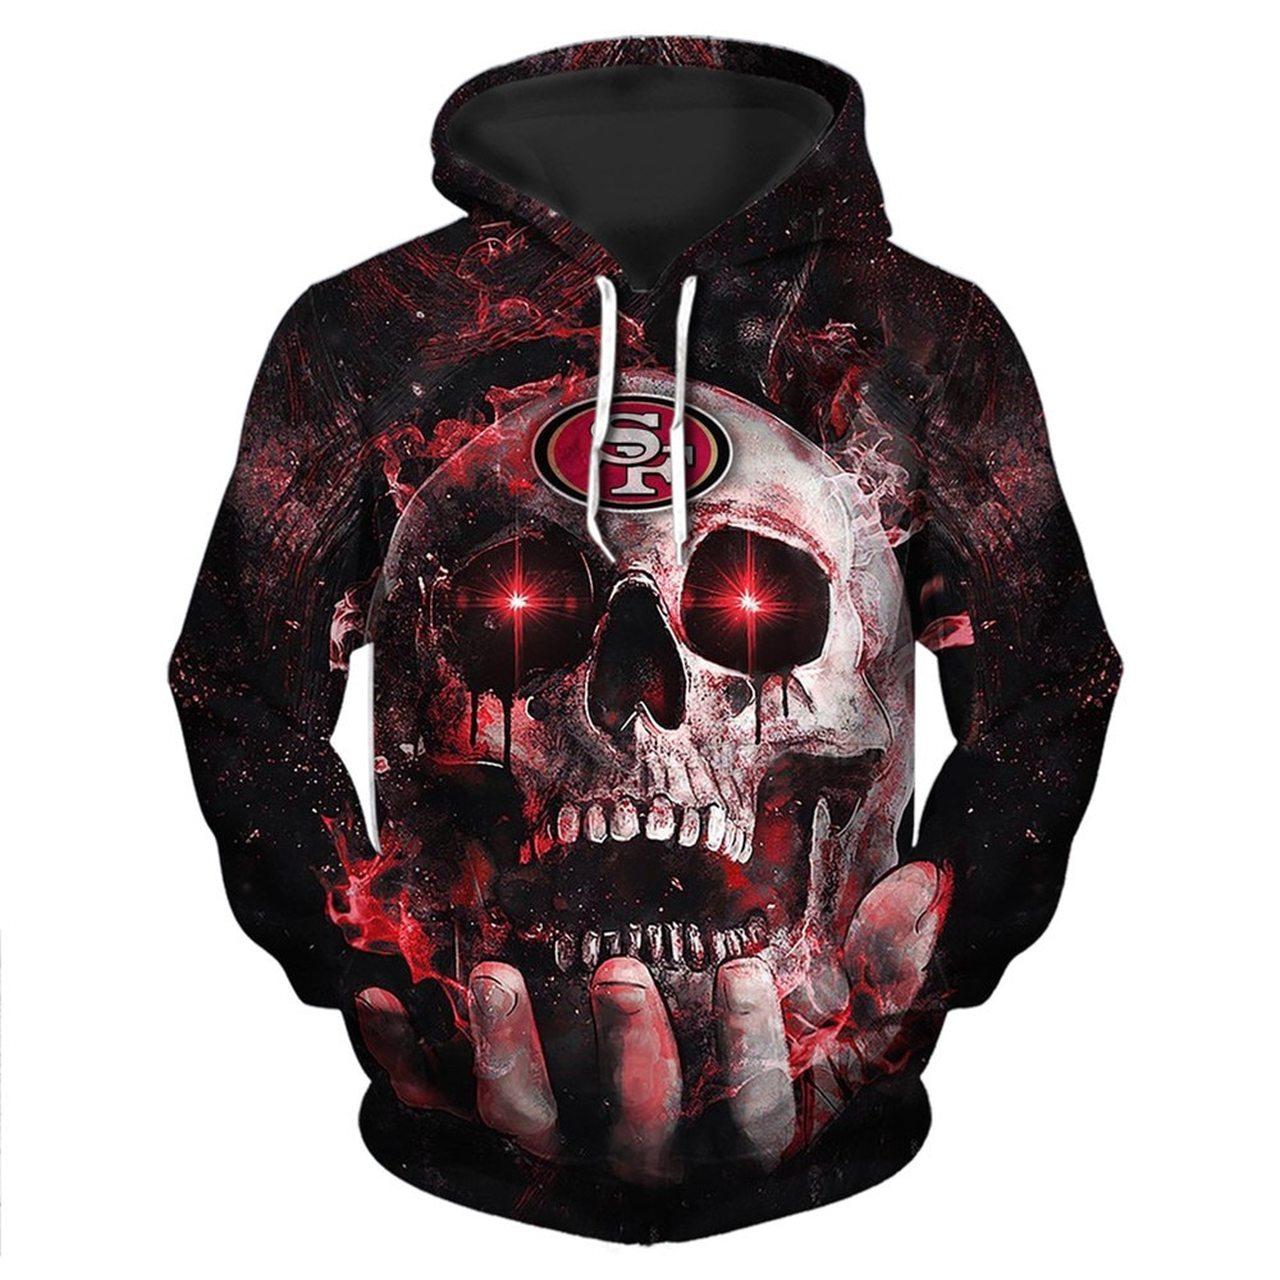 Electro skull san francisco 49ers full printing hoodie 1